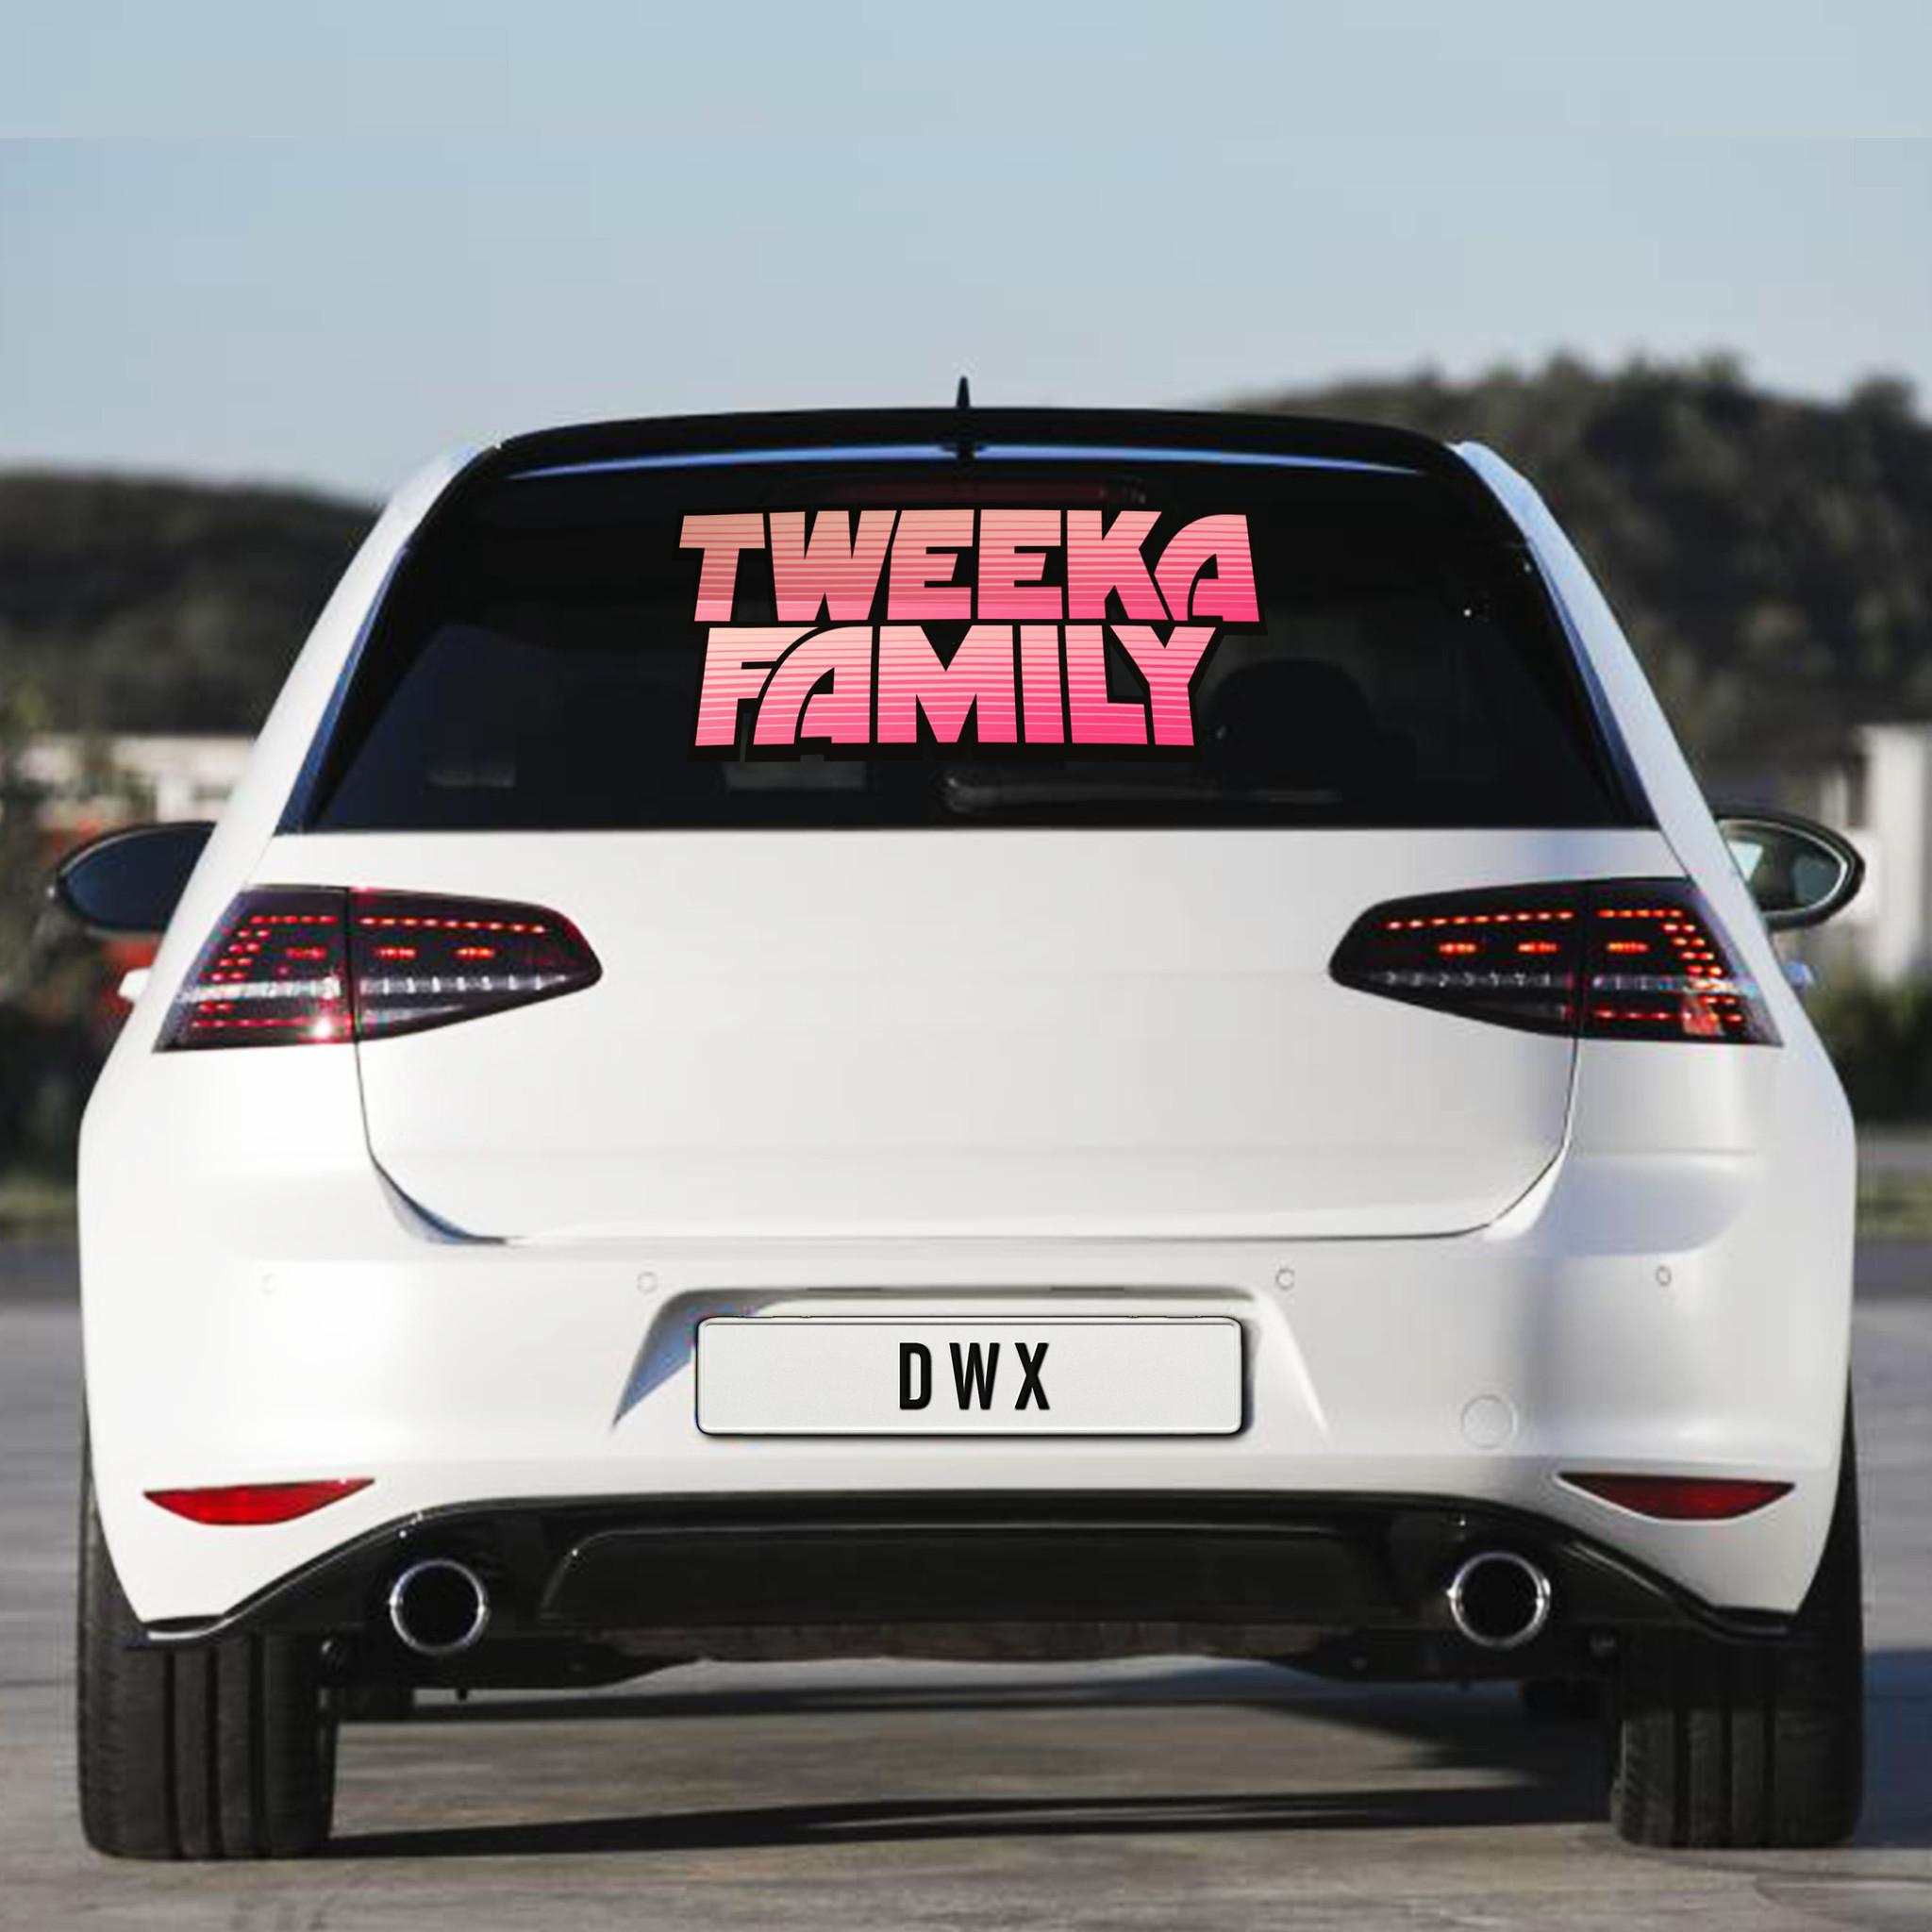 Tweeka Family Carsticker